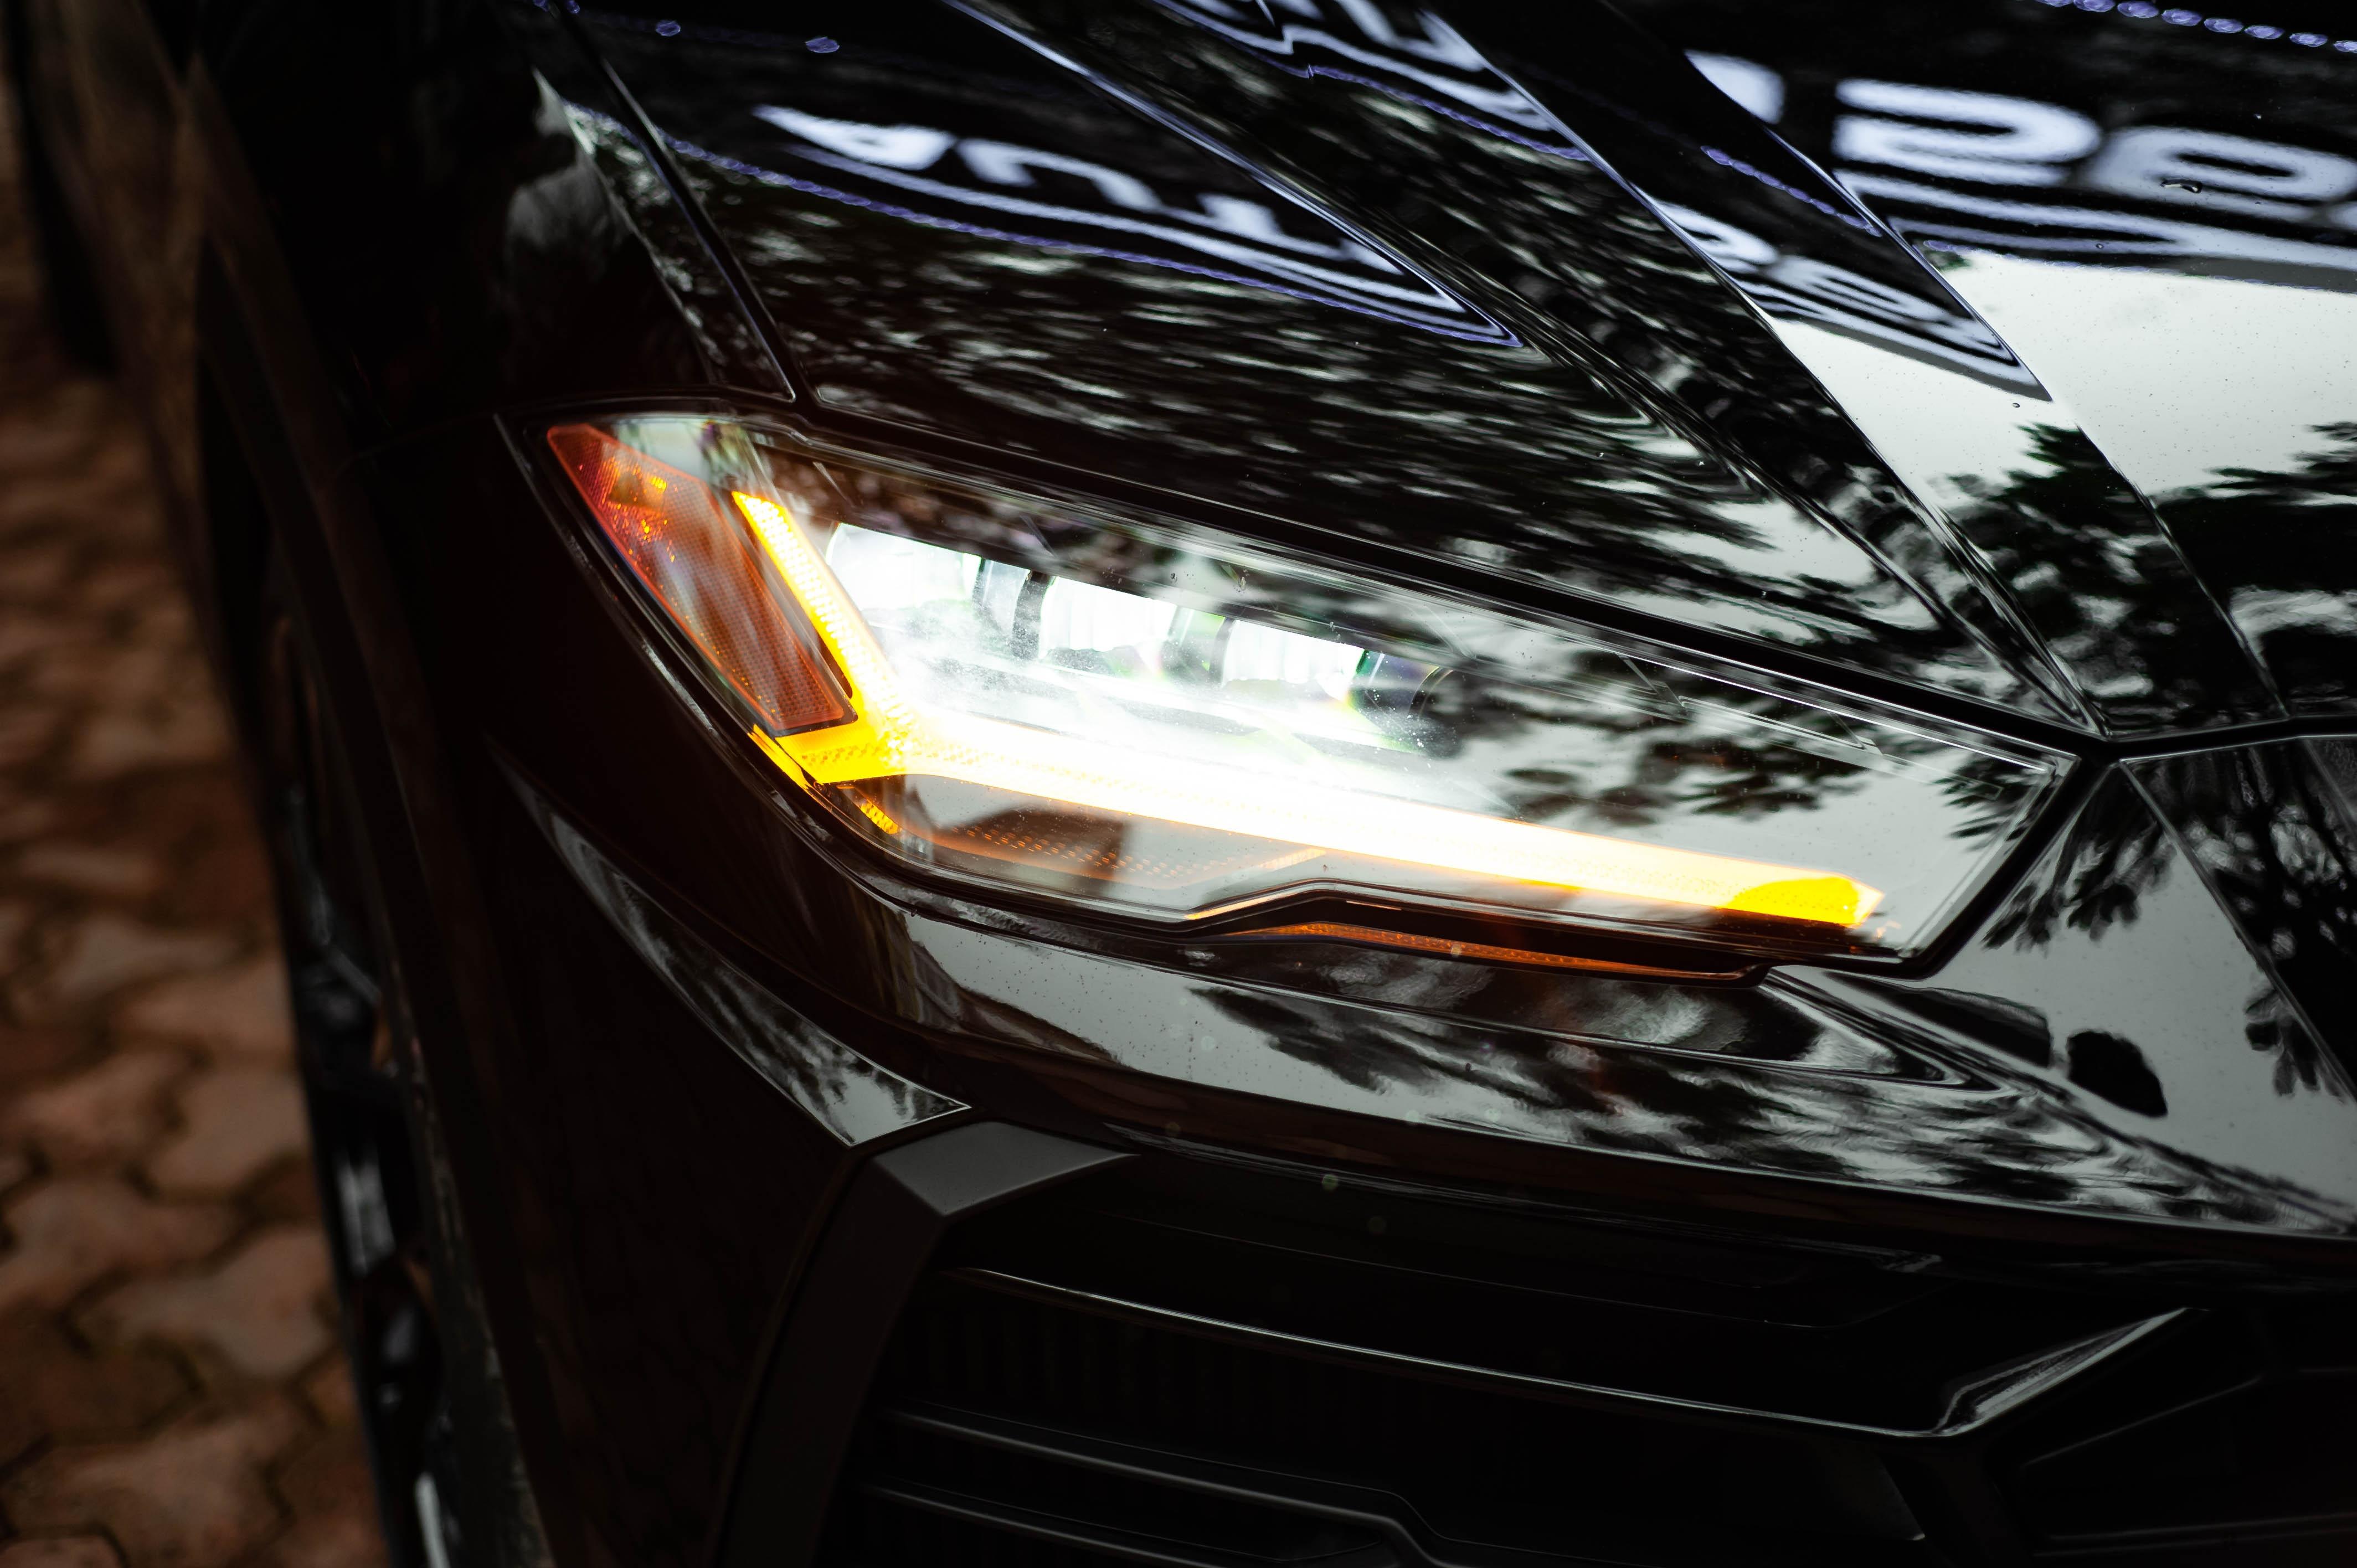 Ngam Lamborghini Urus mau den dau tien ve VN, gia khoang 1 trieu USD hinh anh 4 Urus_zing_22_.jpg